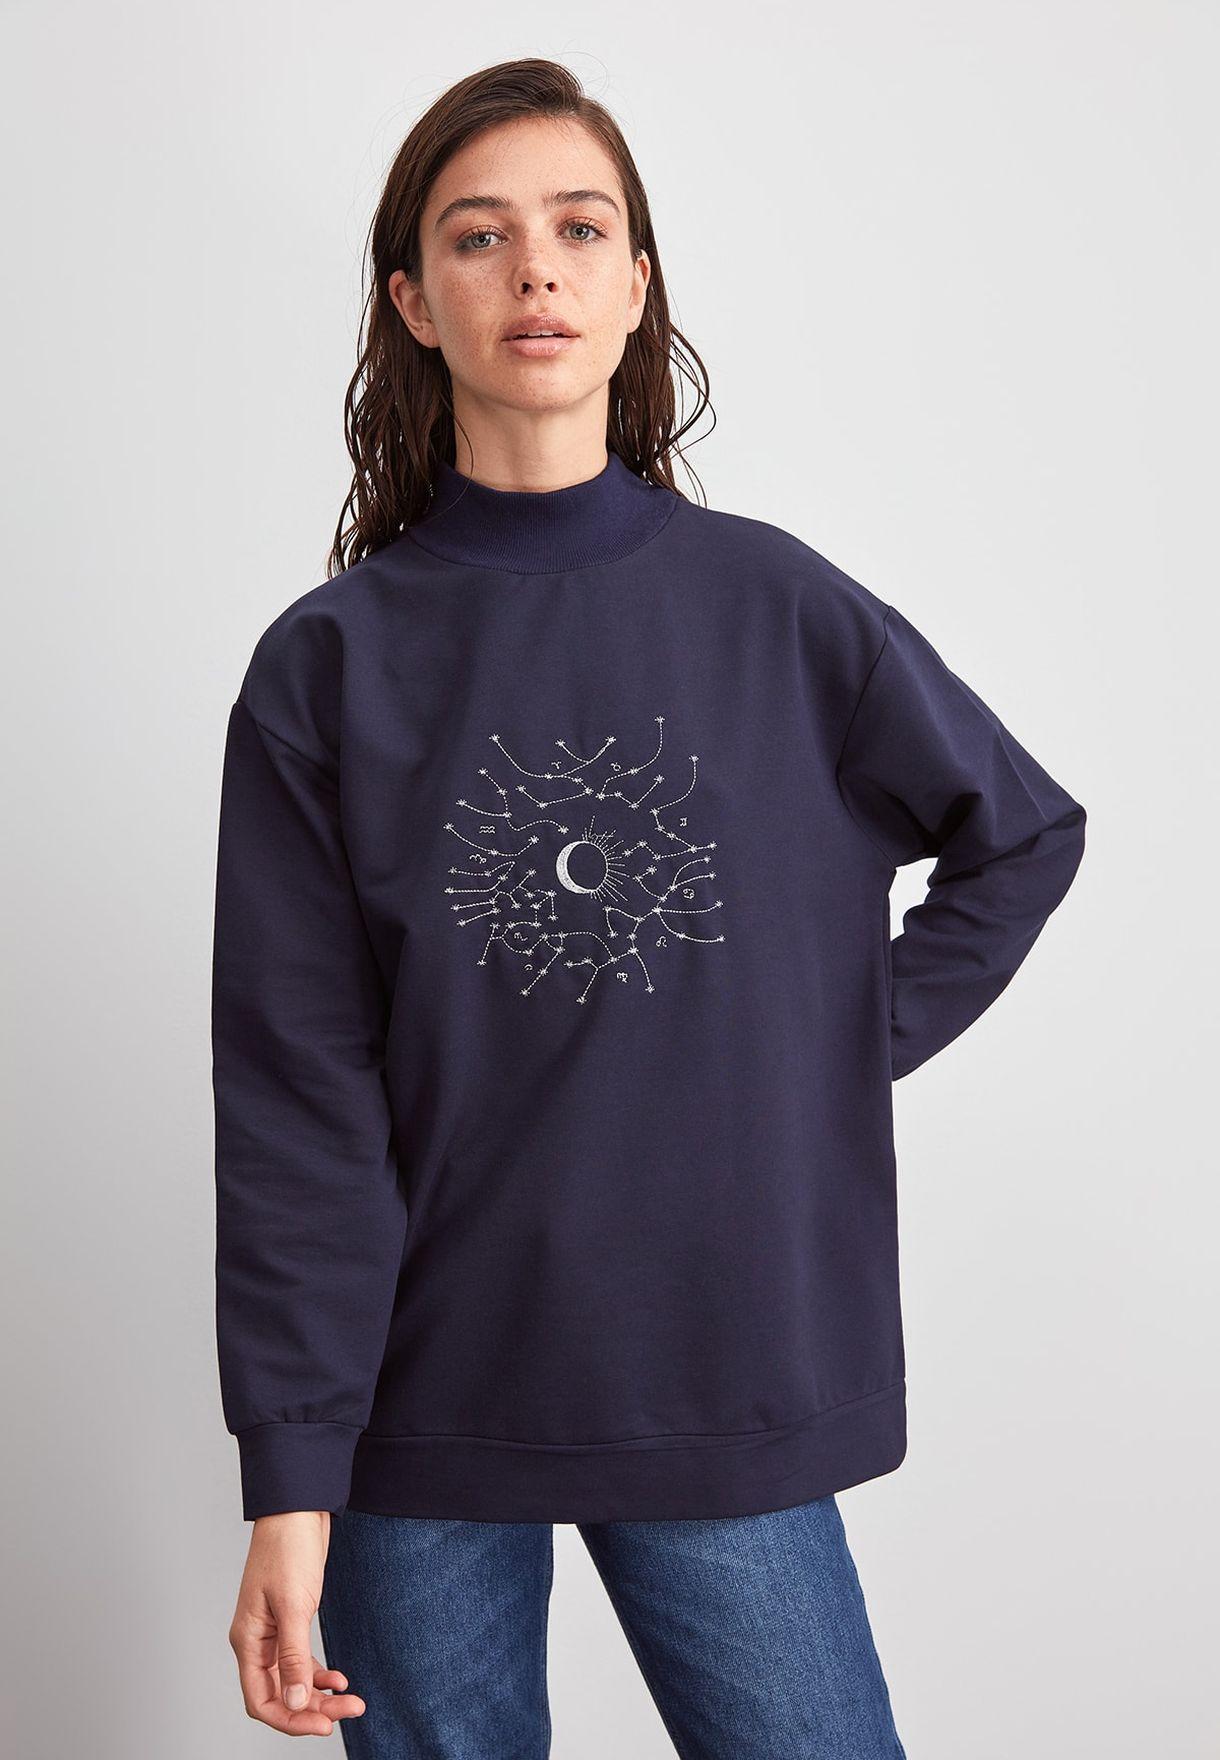 Graphic Oversized Sweatshirt